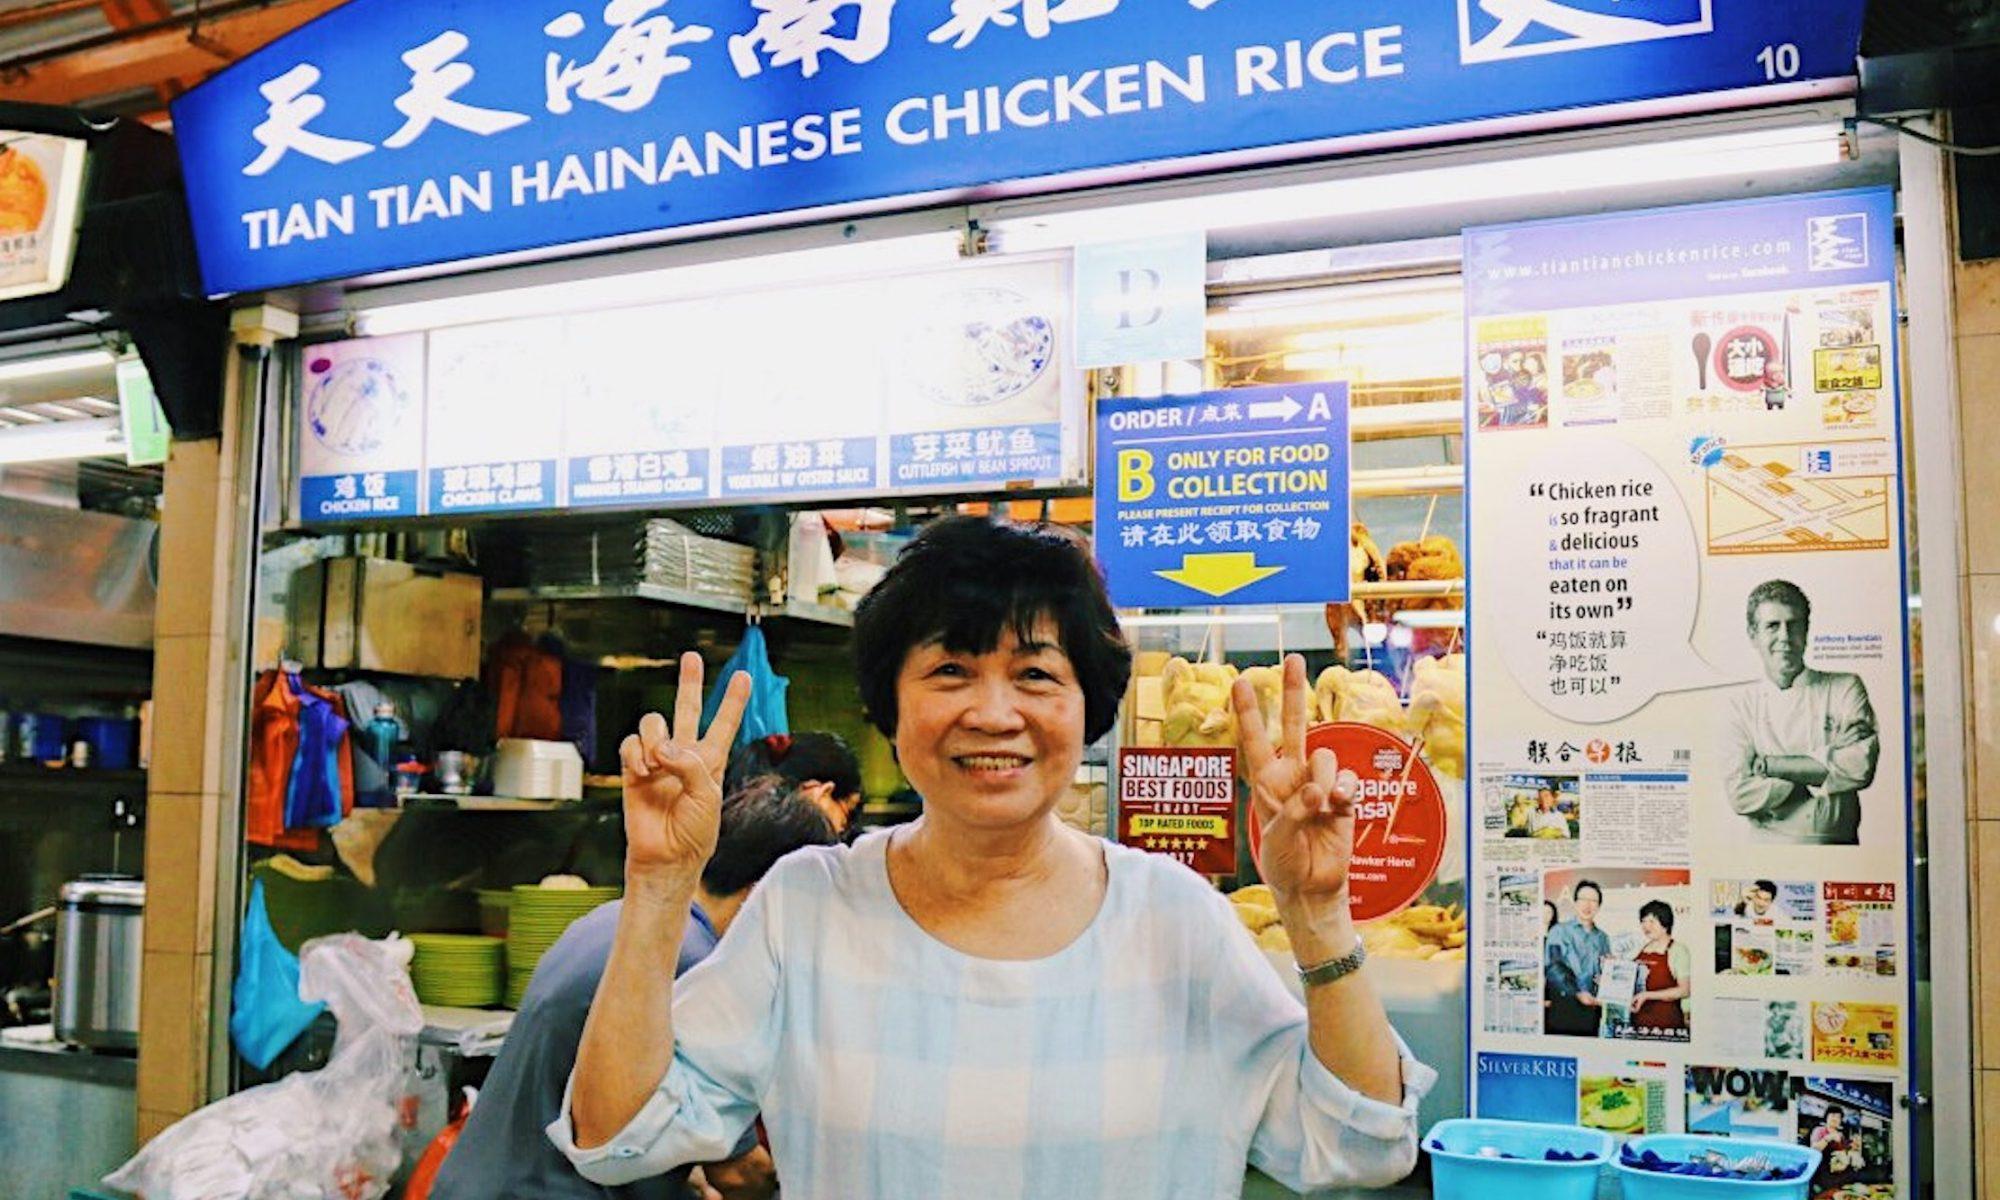 Tian Tian Chicken Rice WhyQ